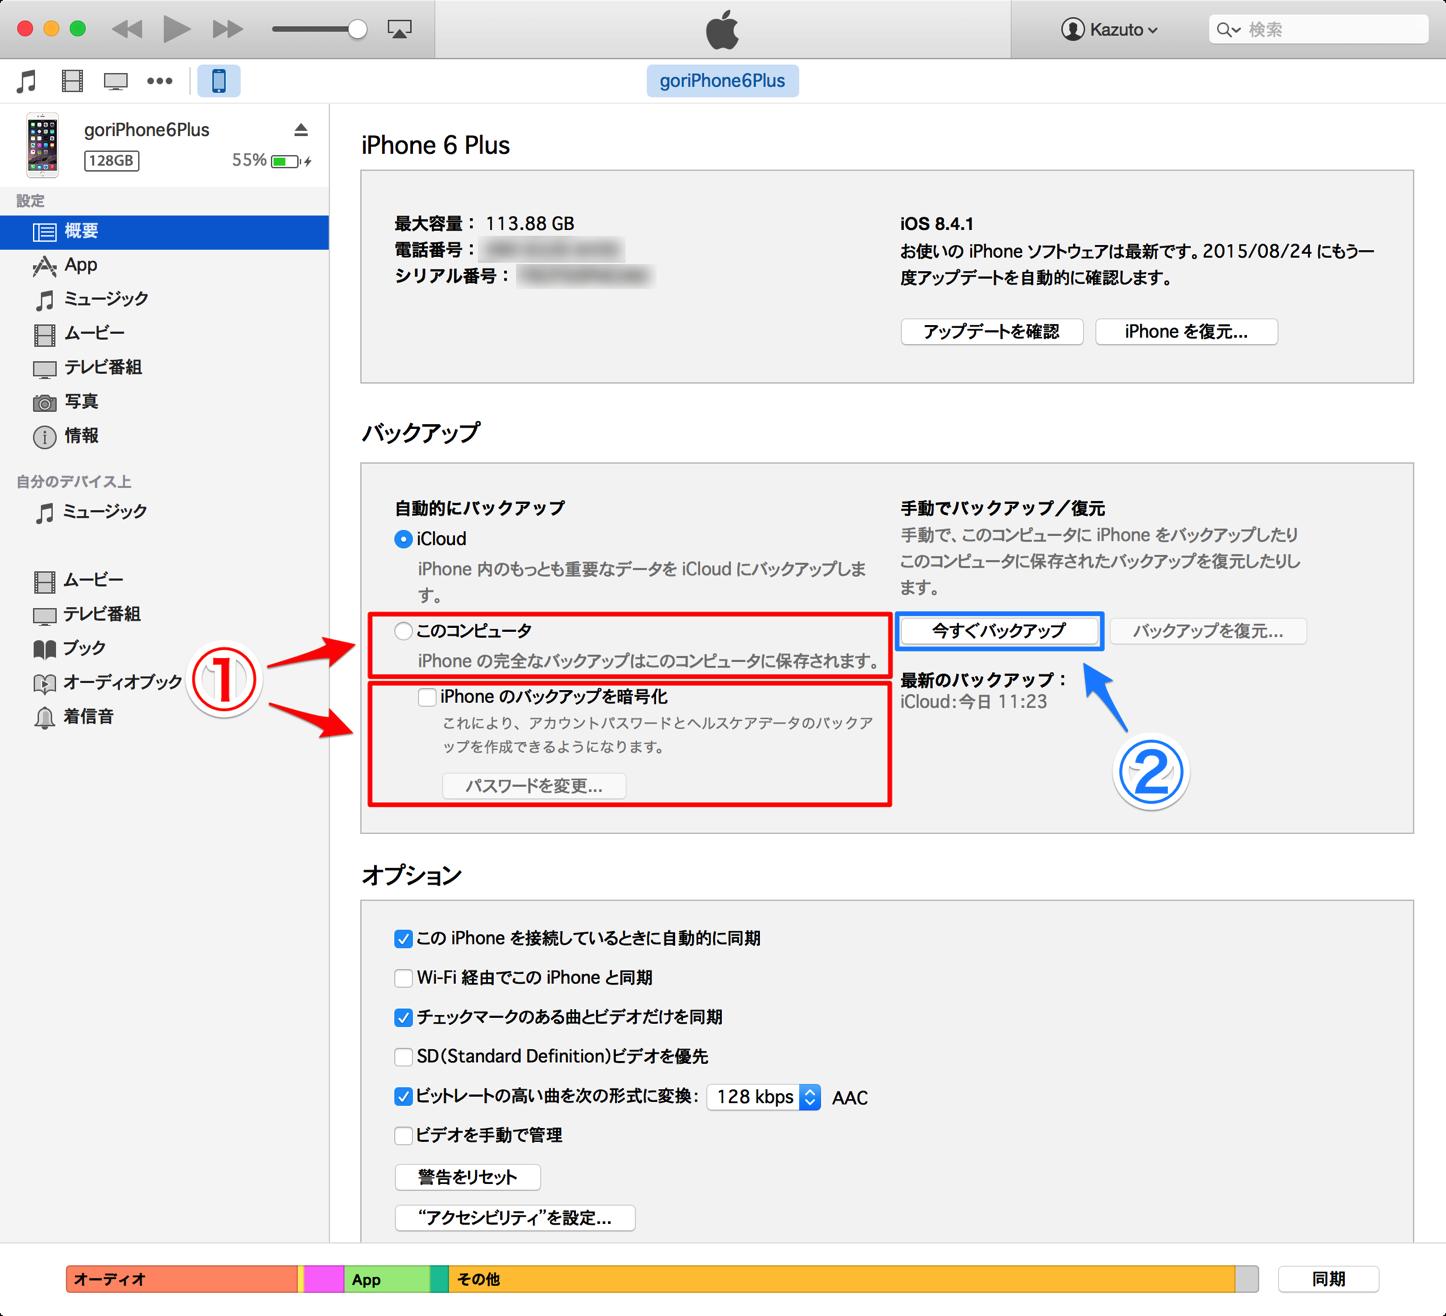 iPhoneのストレージ容量を圧迫している余計なデータを削除する7つの方法